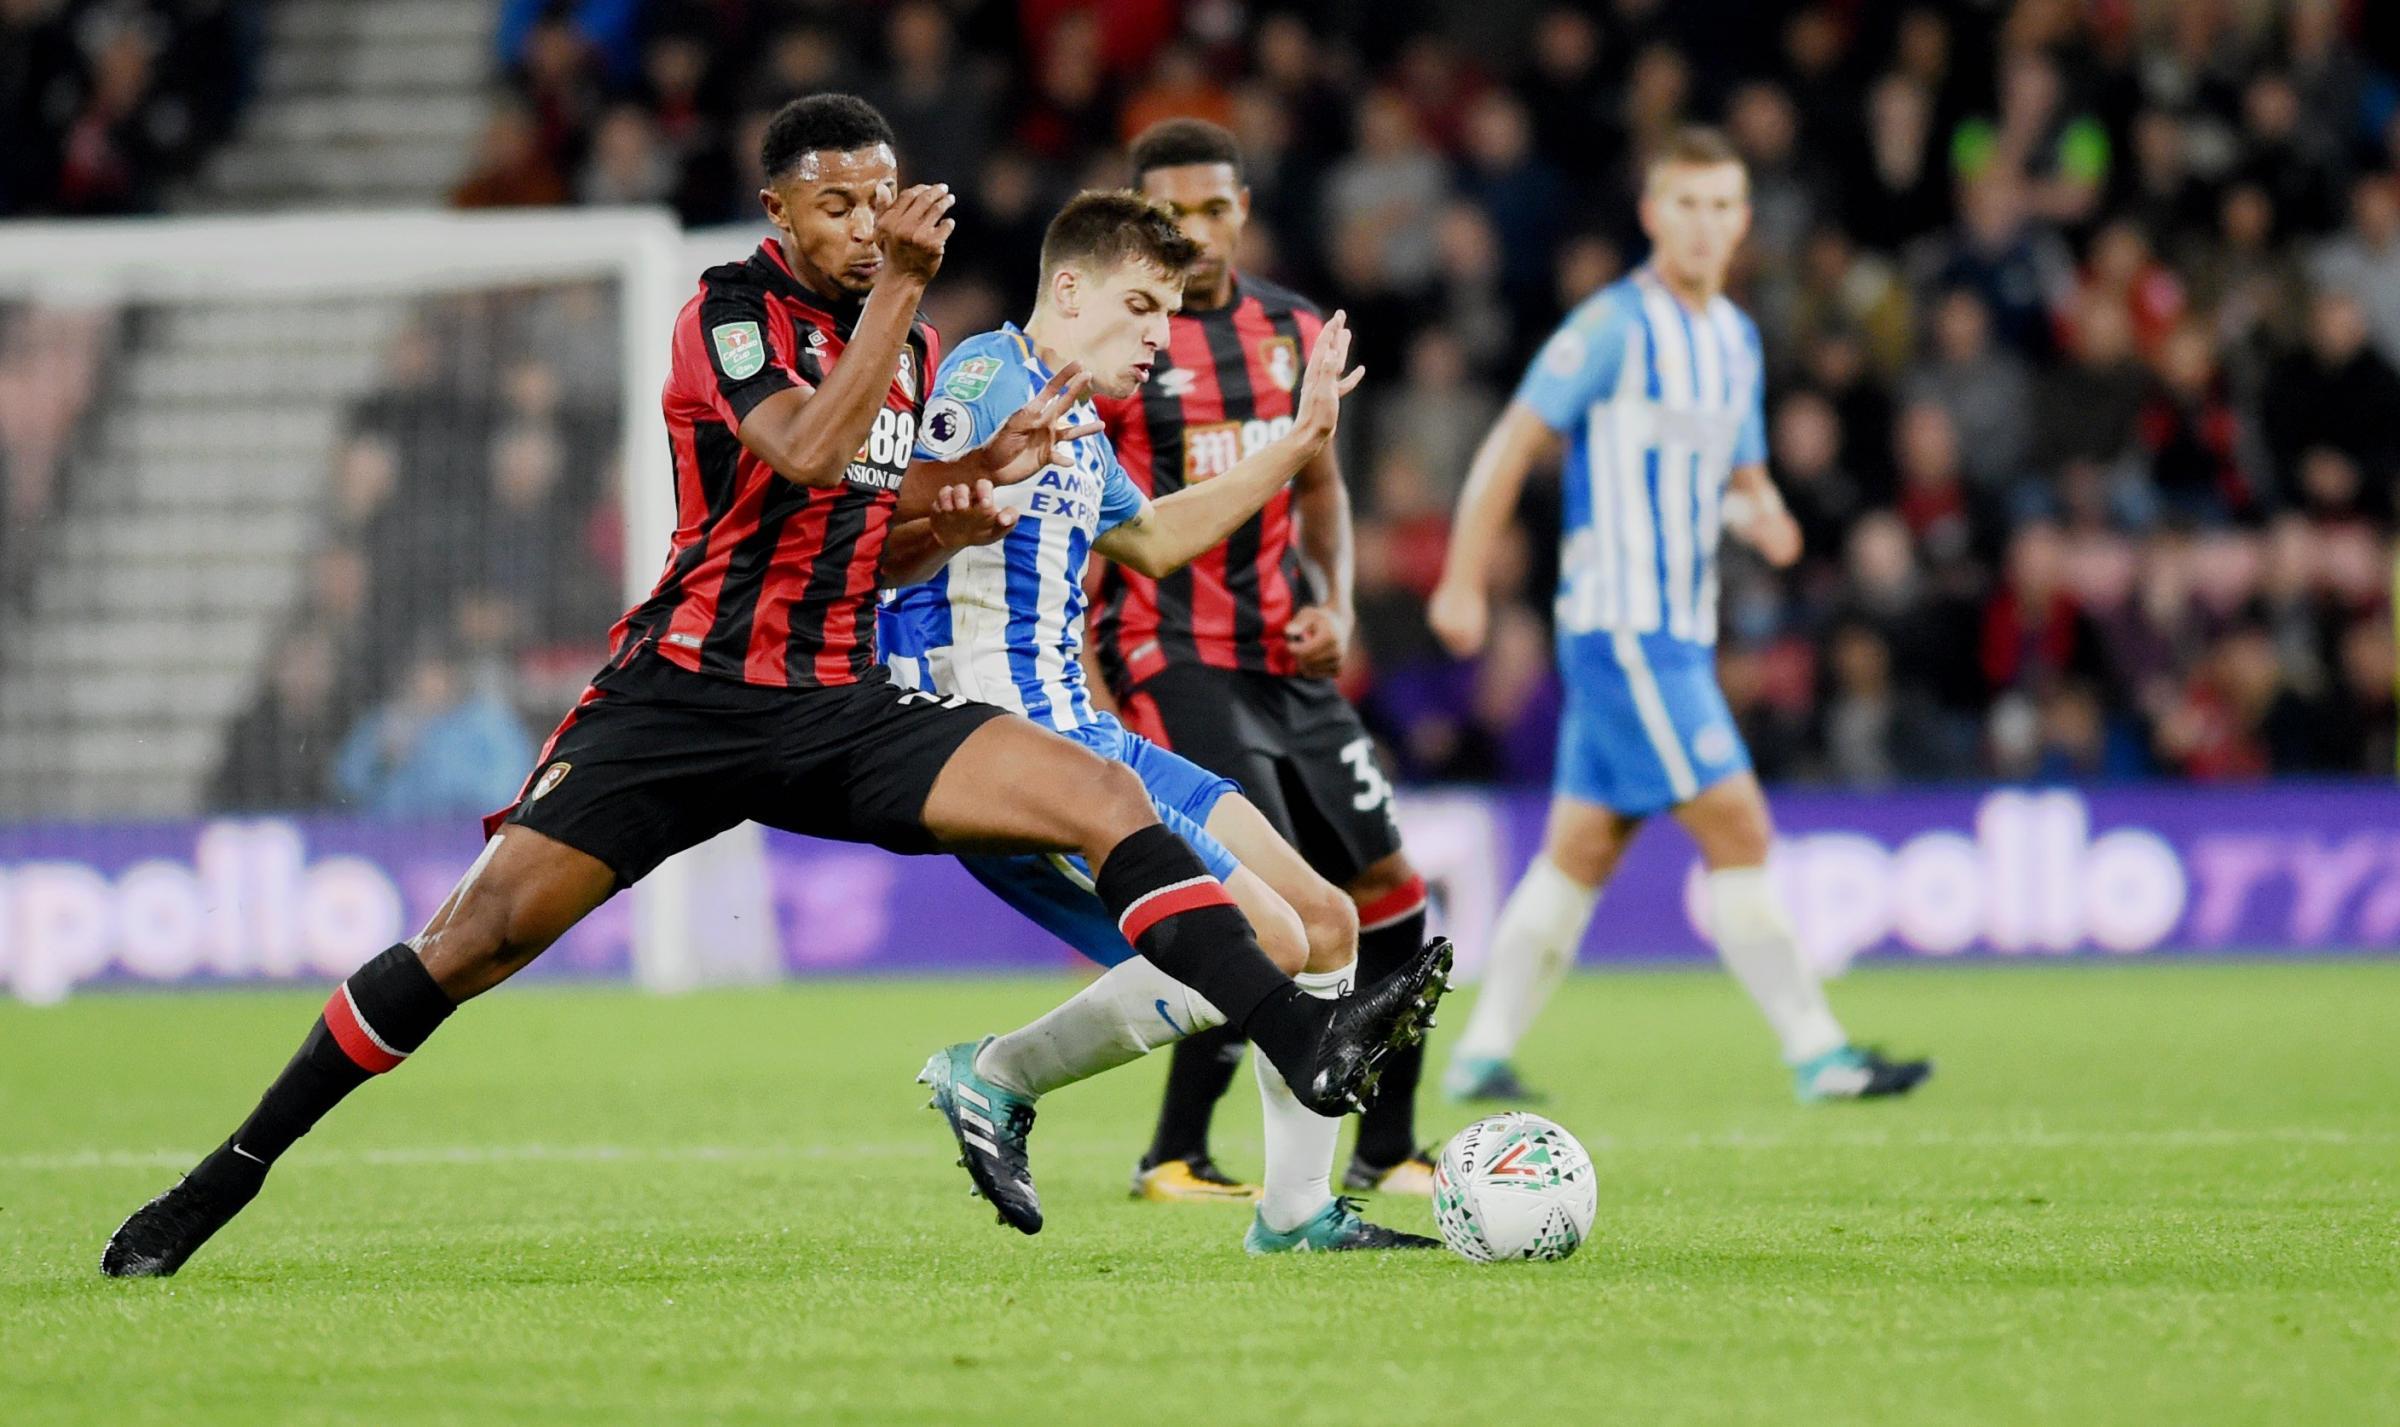 Fit-again Molumby earns international call-up